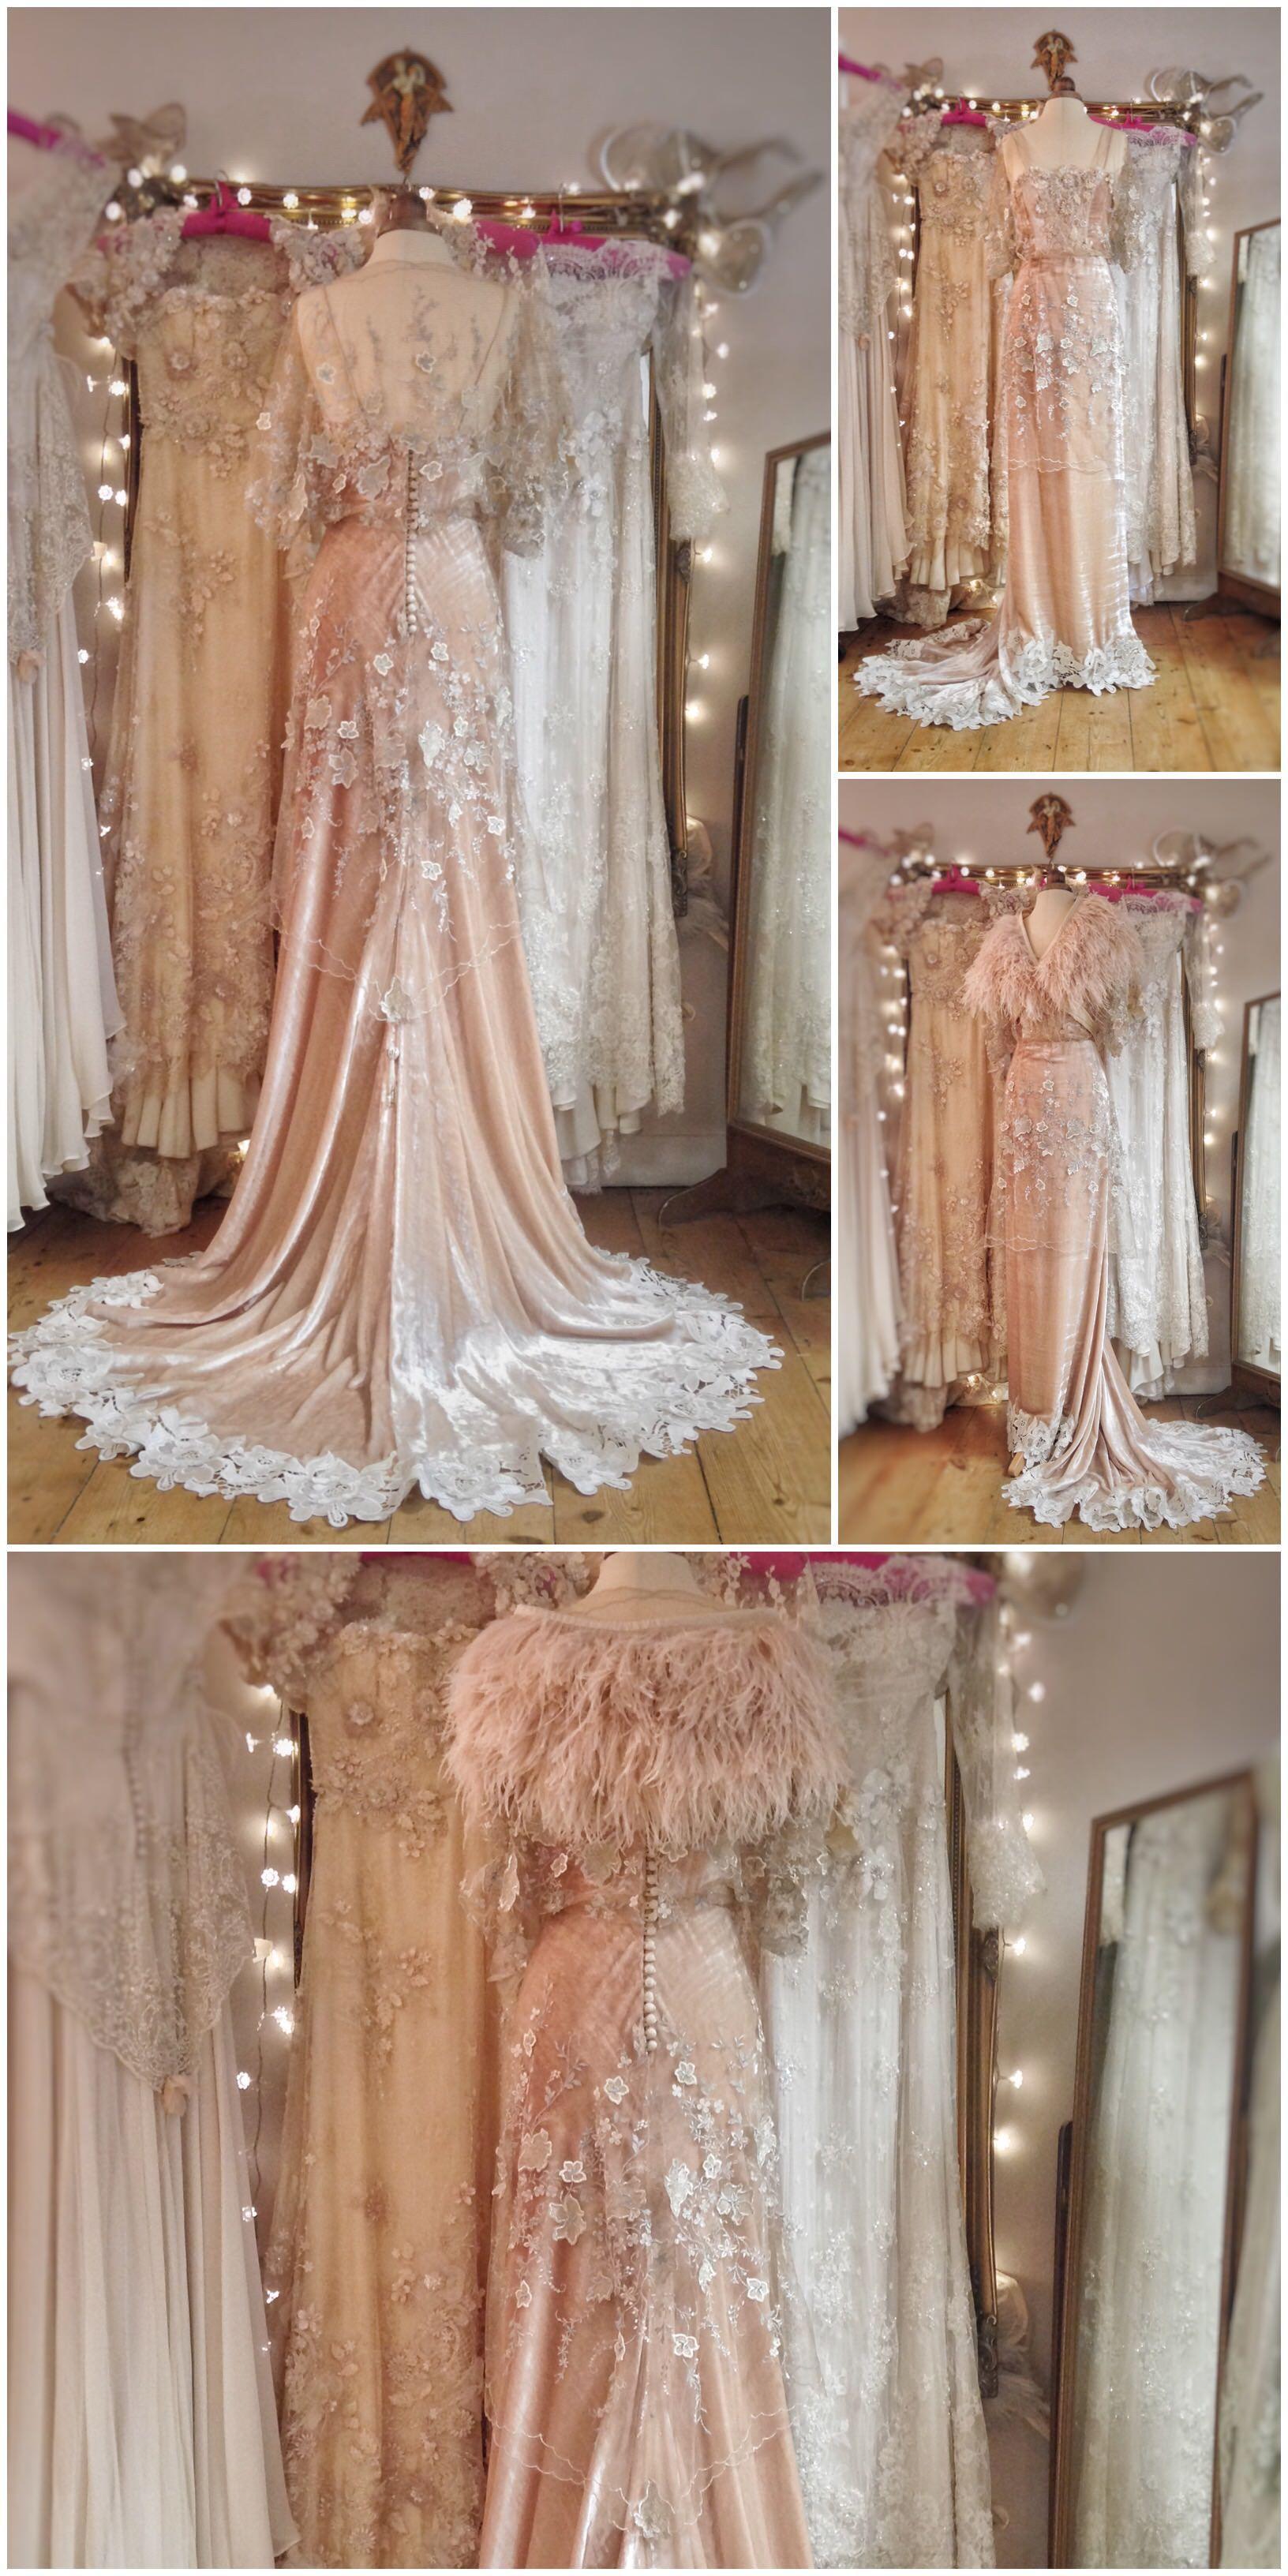 000ba7bcd5a Champagne silk velvet and embroidered tulle Belle Epoque inspired wedding  dress by Joanne Fleming Design